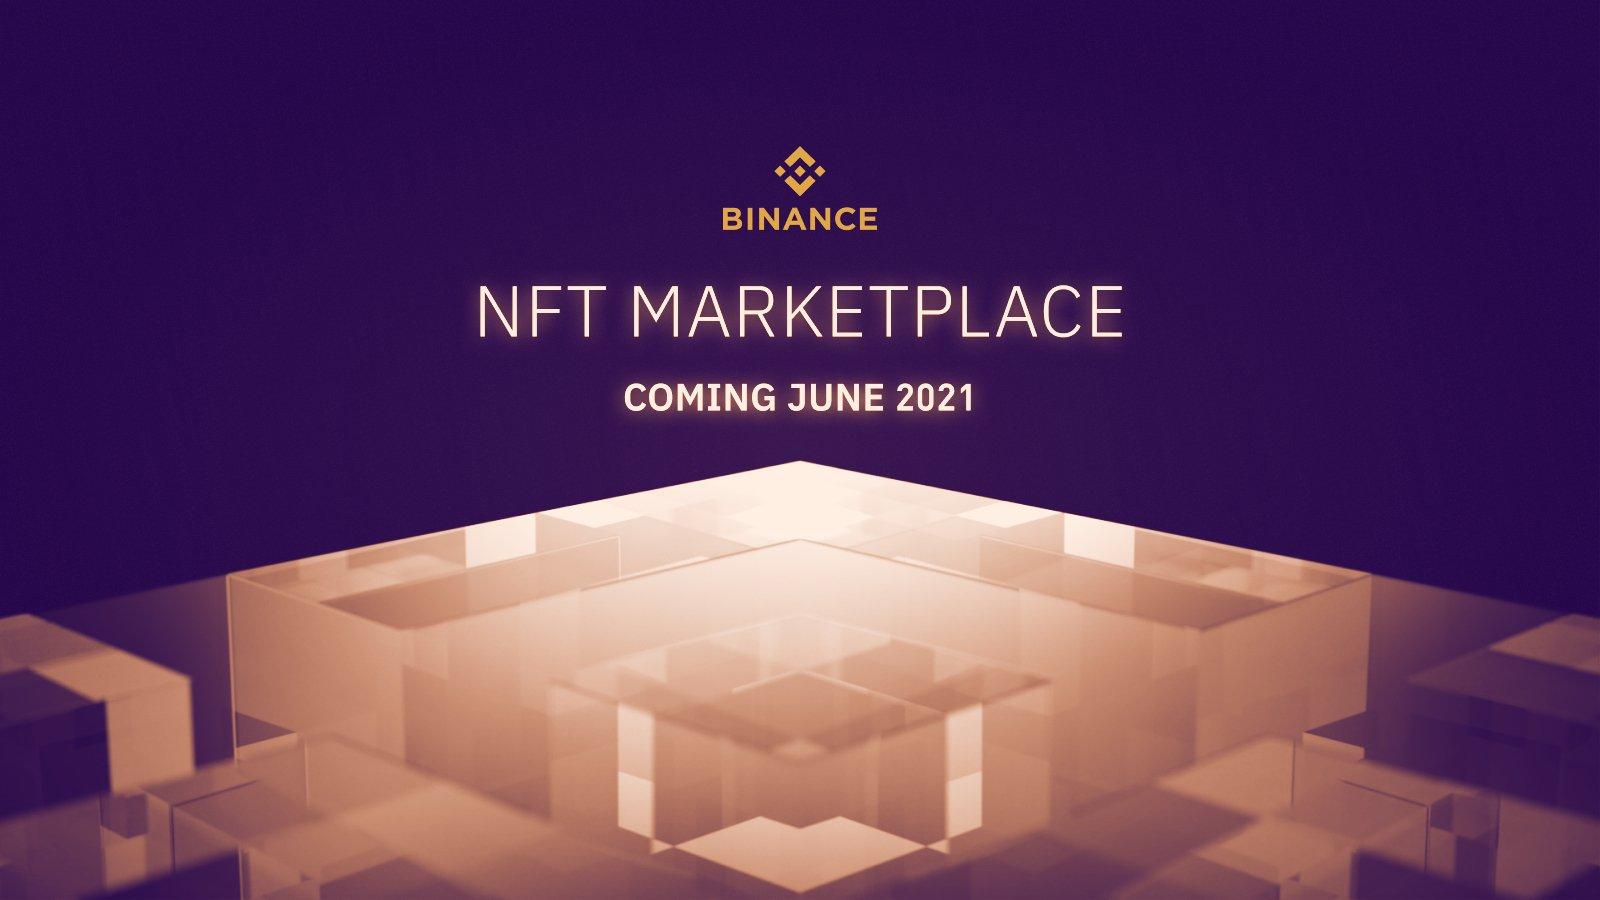 Binance își va lansa propria piață NFT în iunie